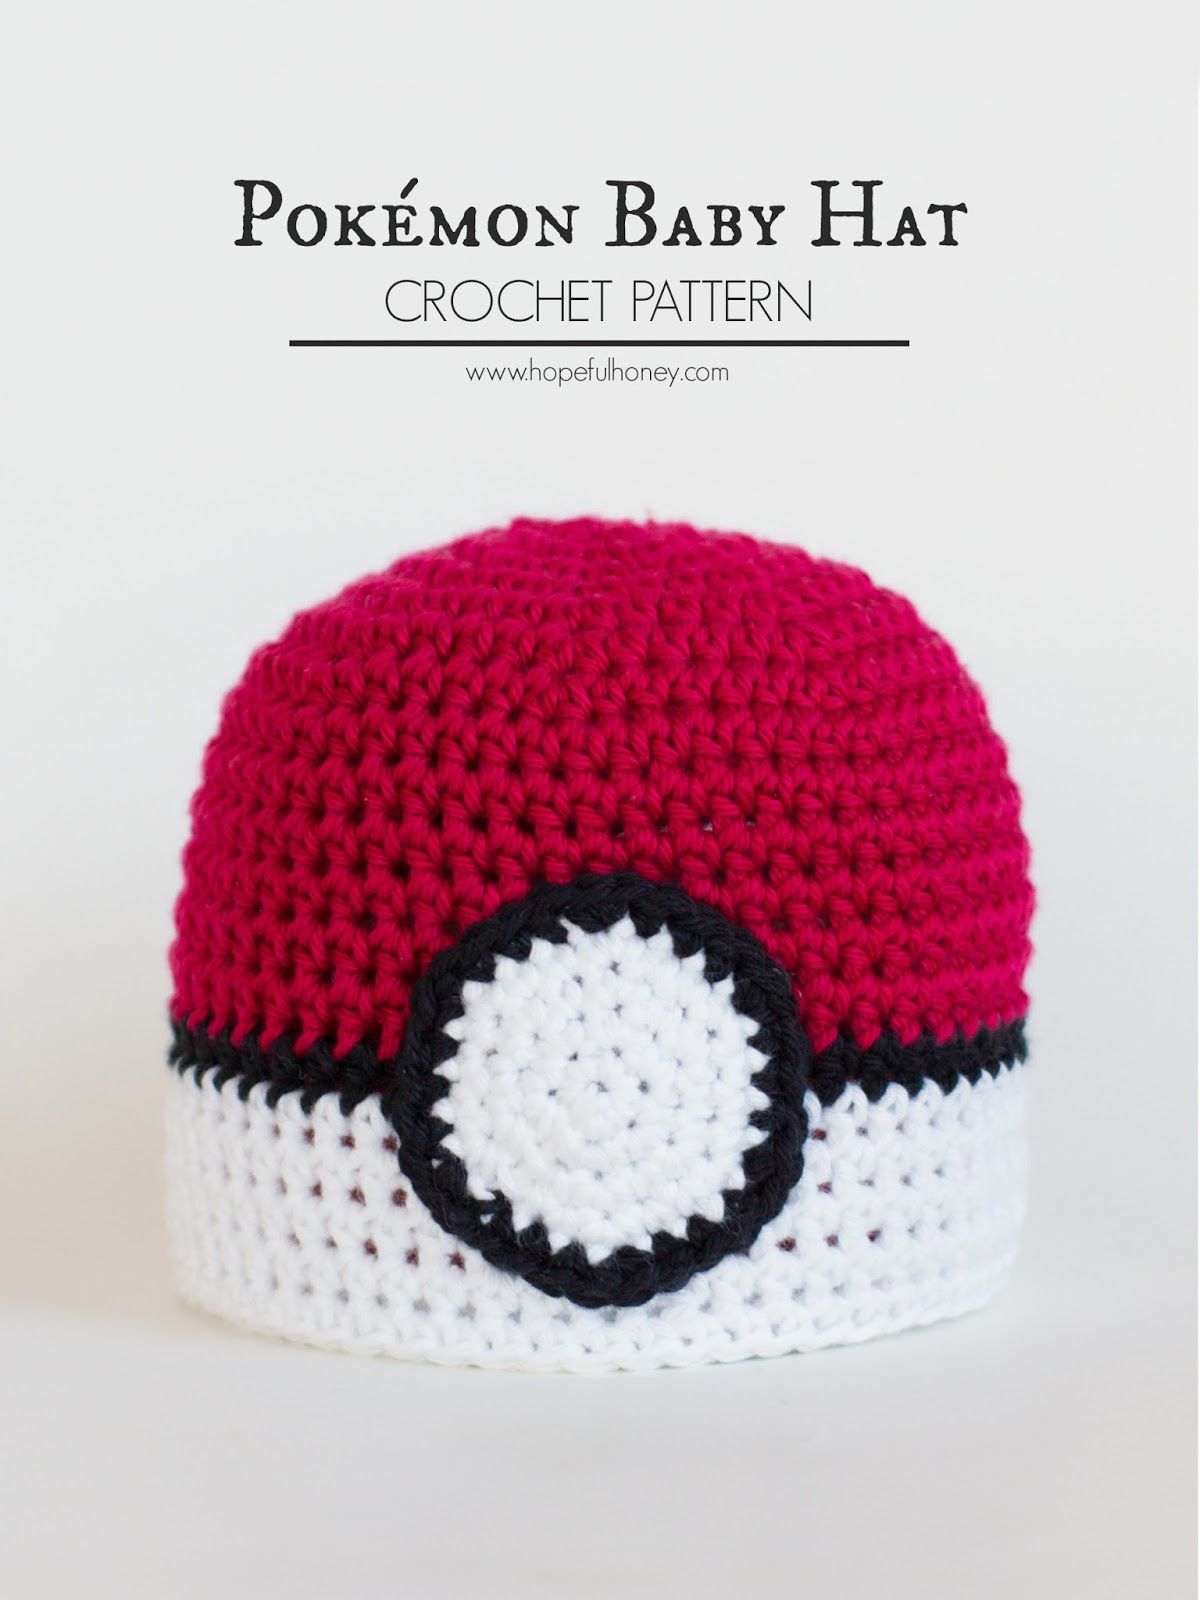 Pokémon Pokéball Inspired Baby Hat - Free Crochet Pattern | Gorros ...